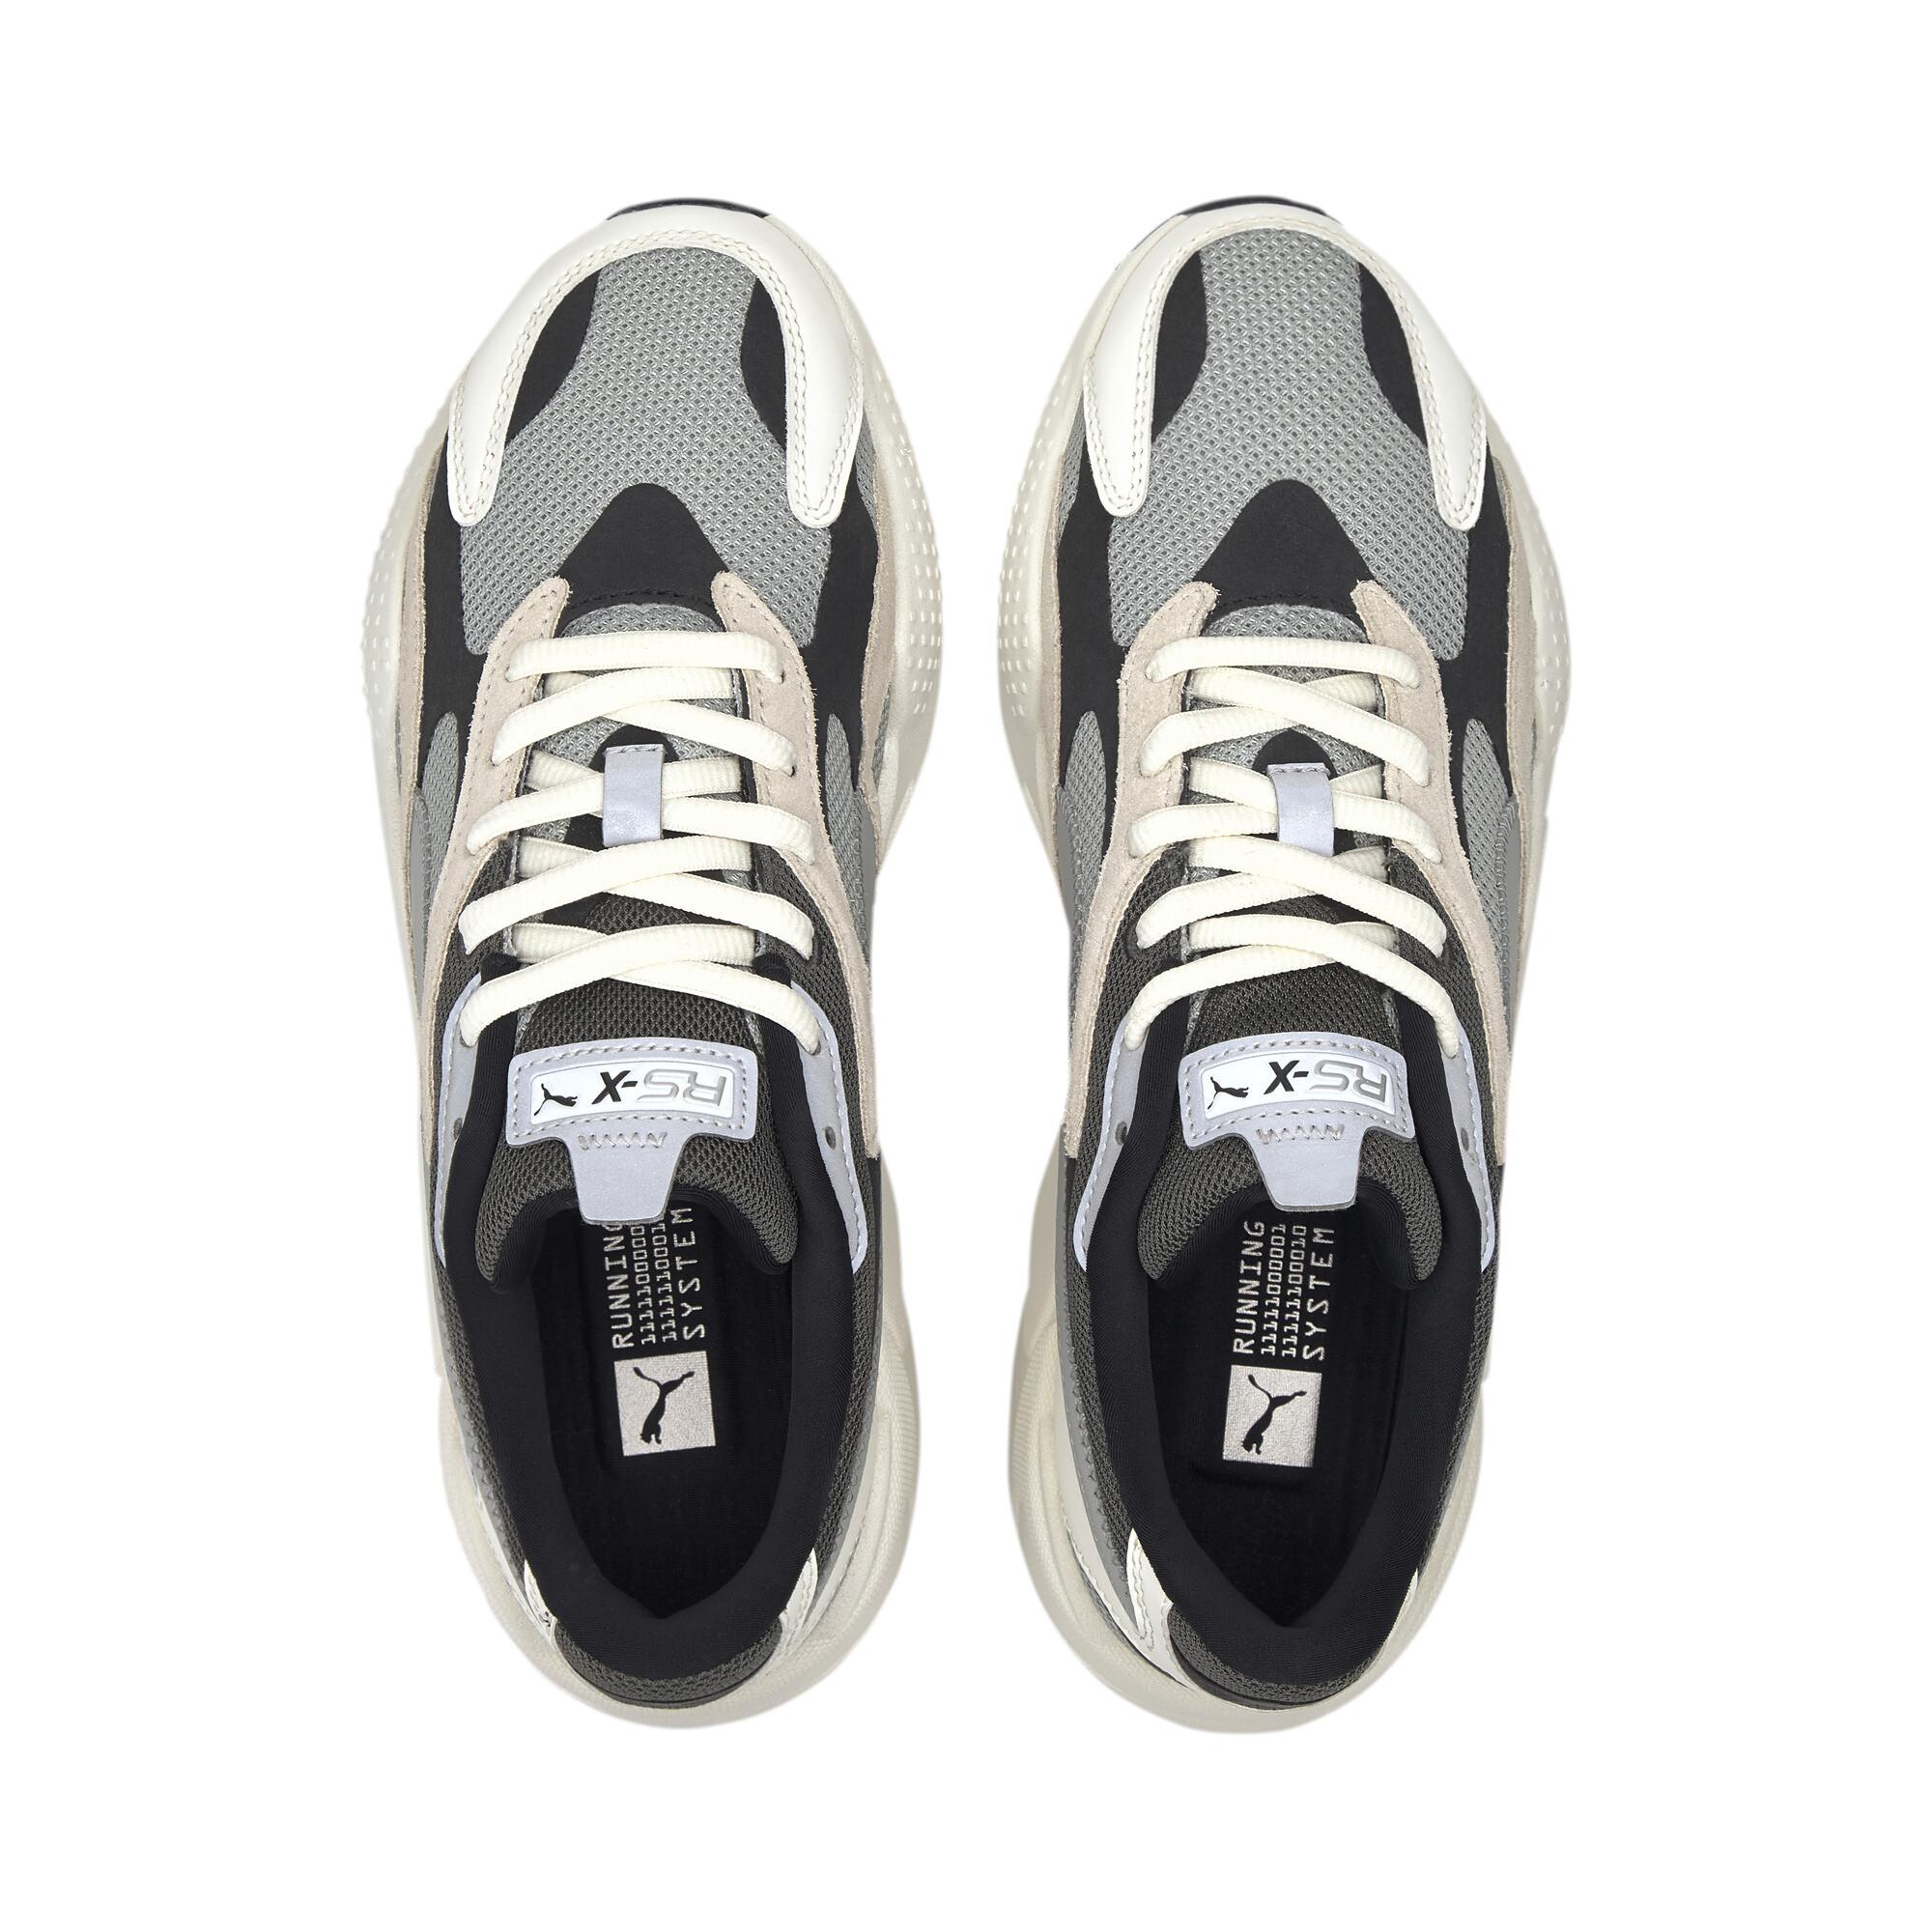 PUMA-Men-039-s-RS-X-Puzzle-Sneakers thumbnail 14